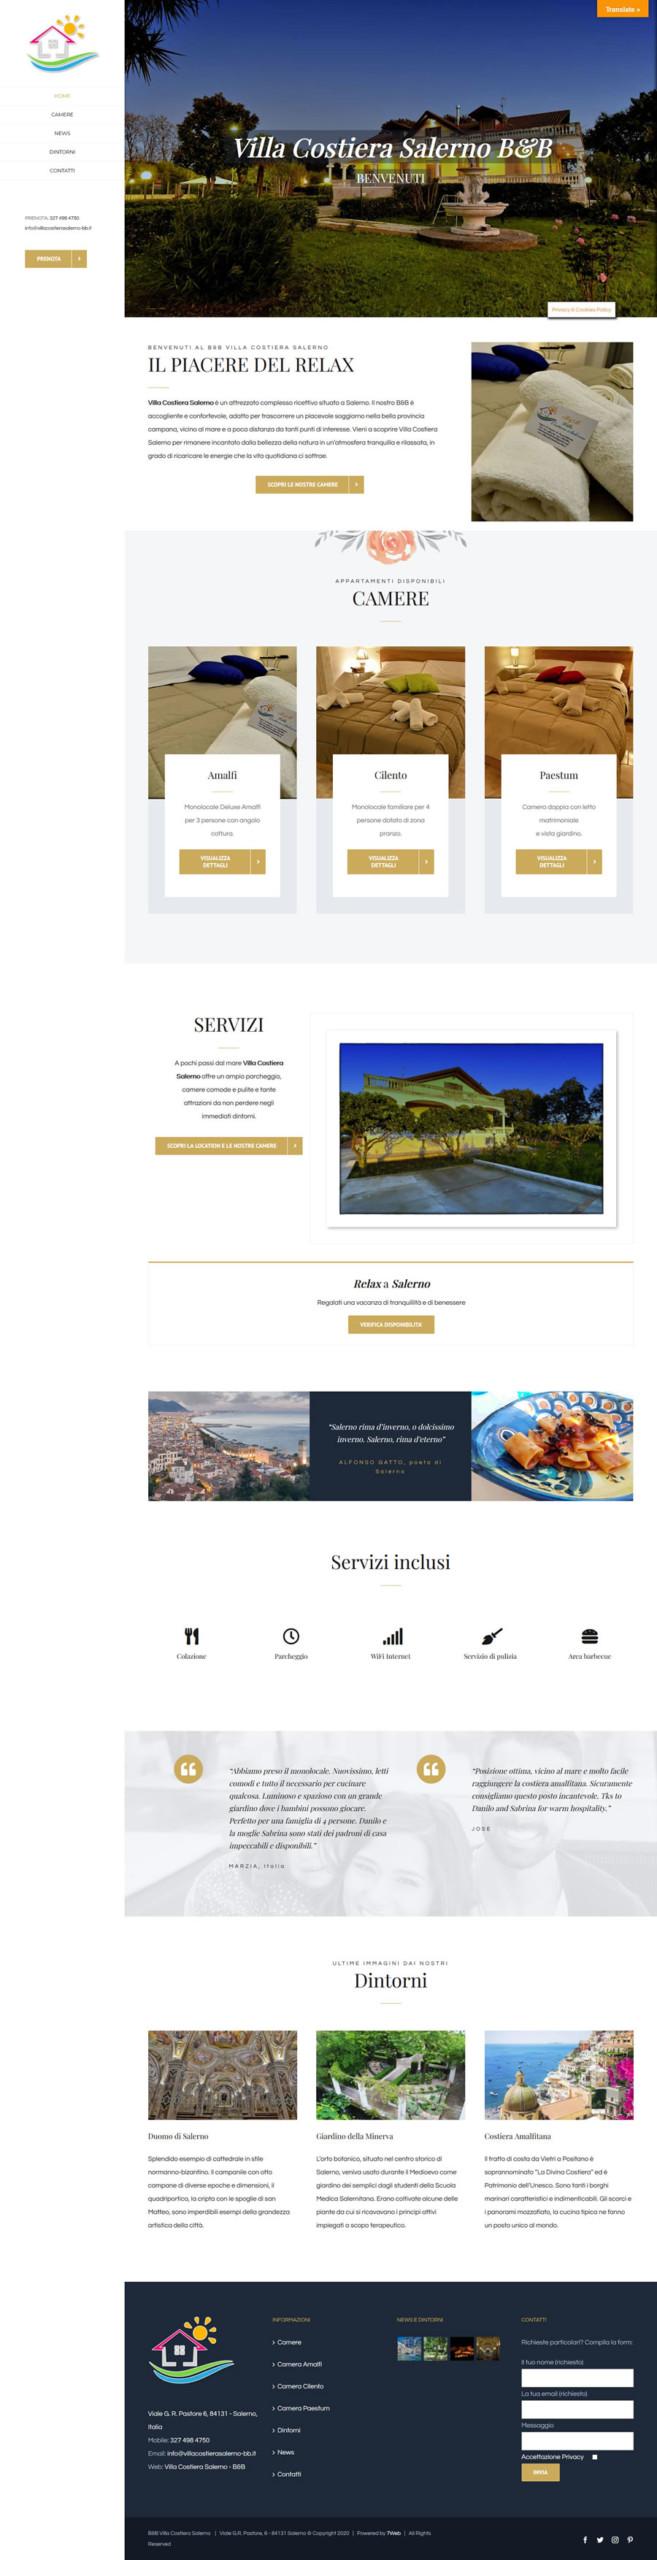 Villacostierasalerno-bb.it - Setteweb.com Portfolio Sito Web WordPress 7Web-2020